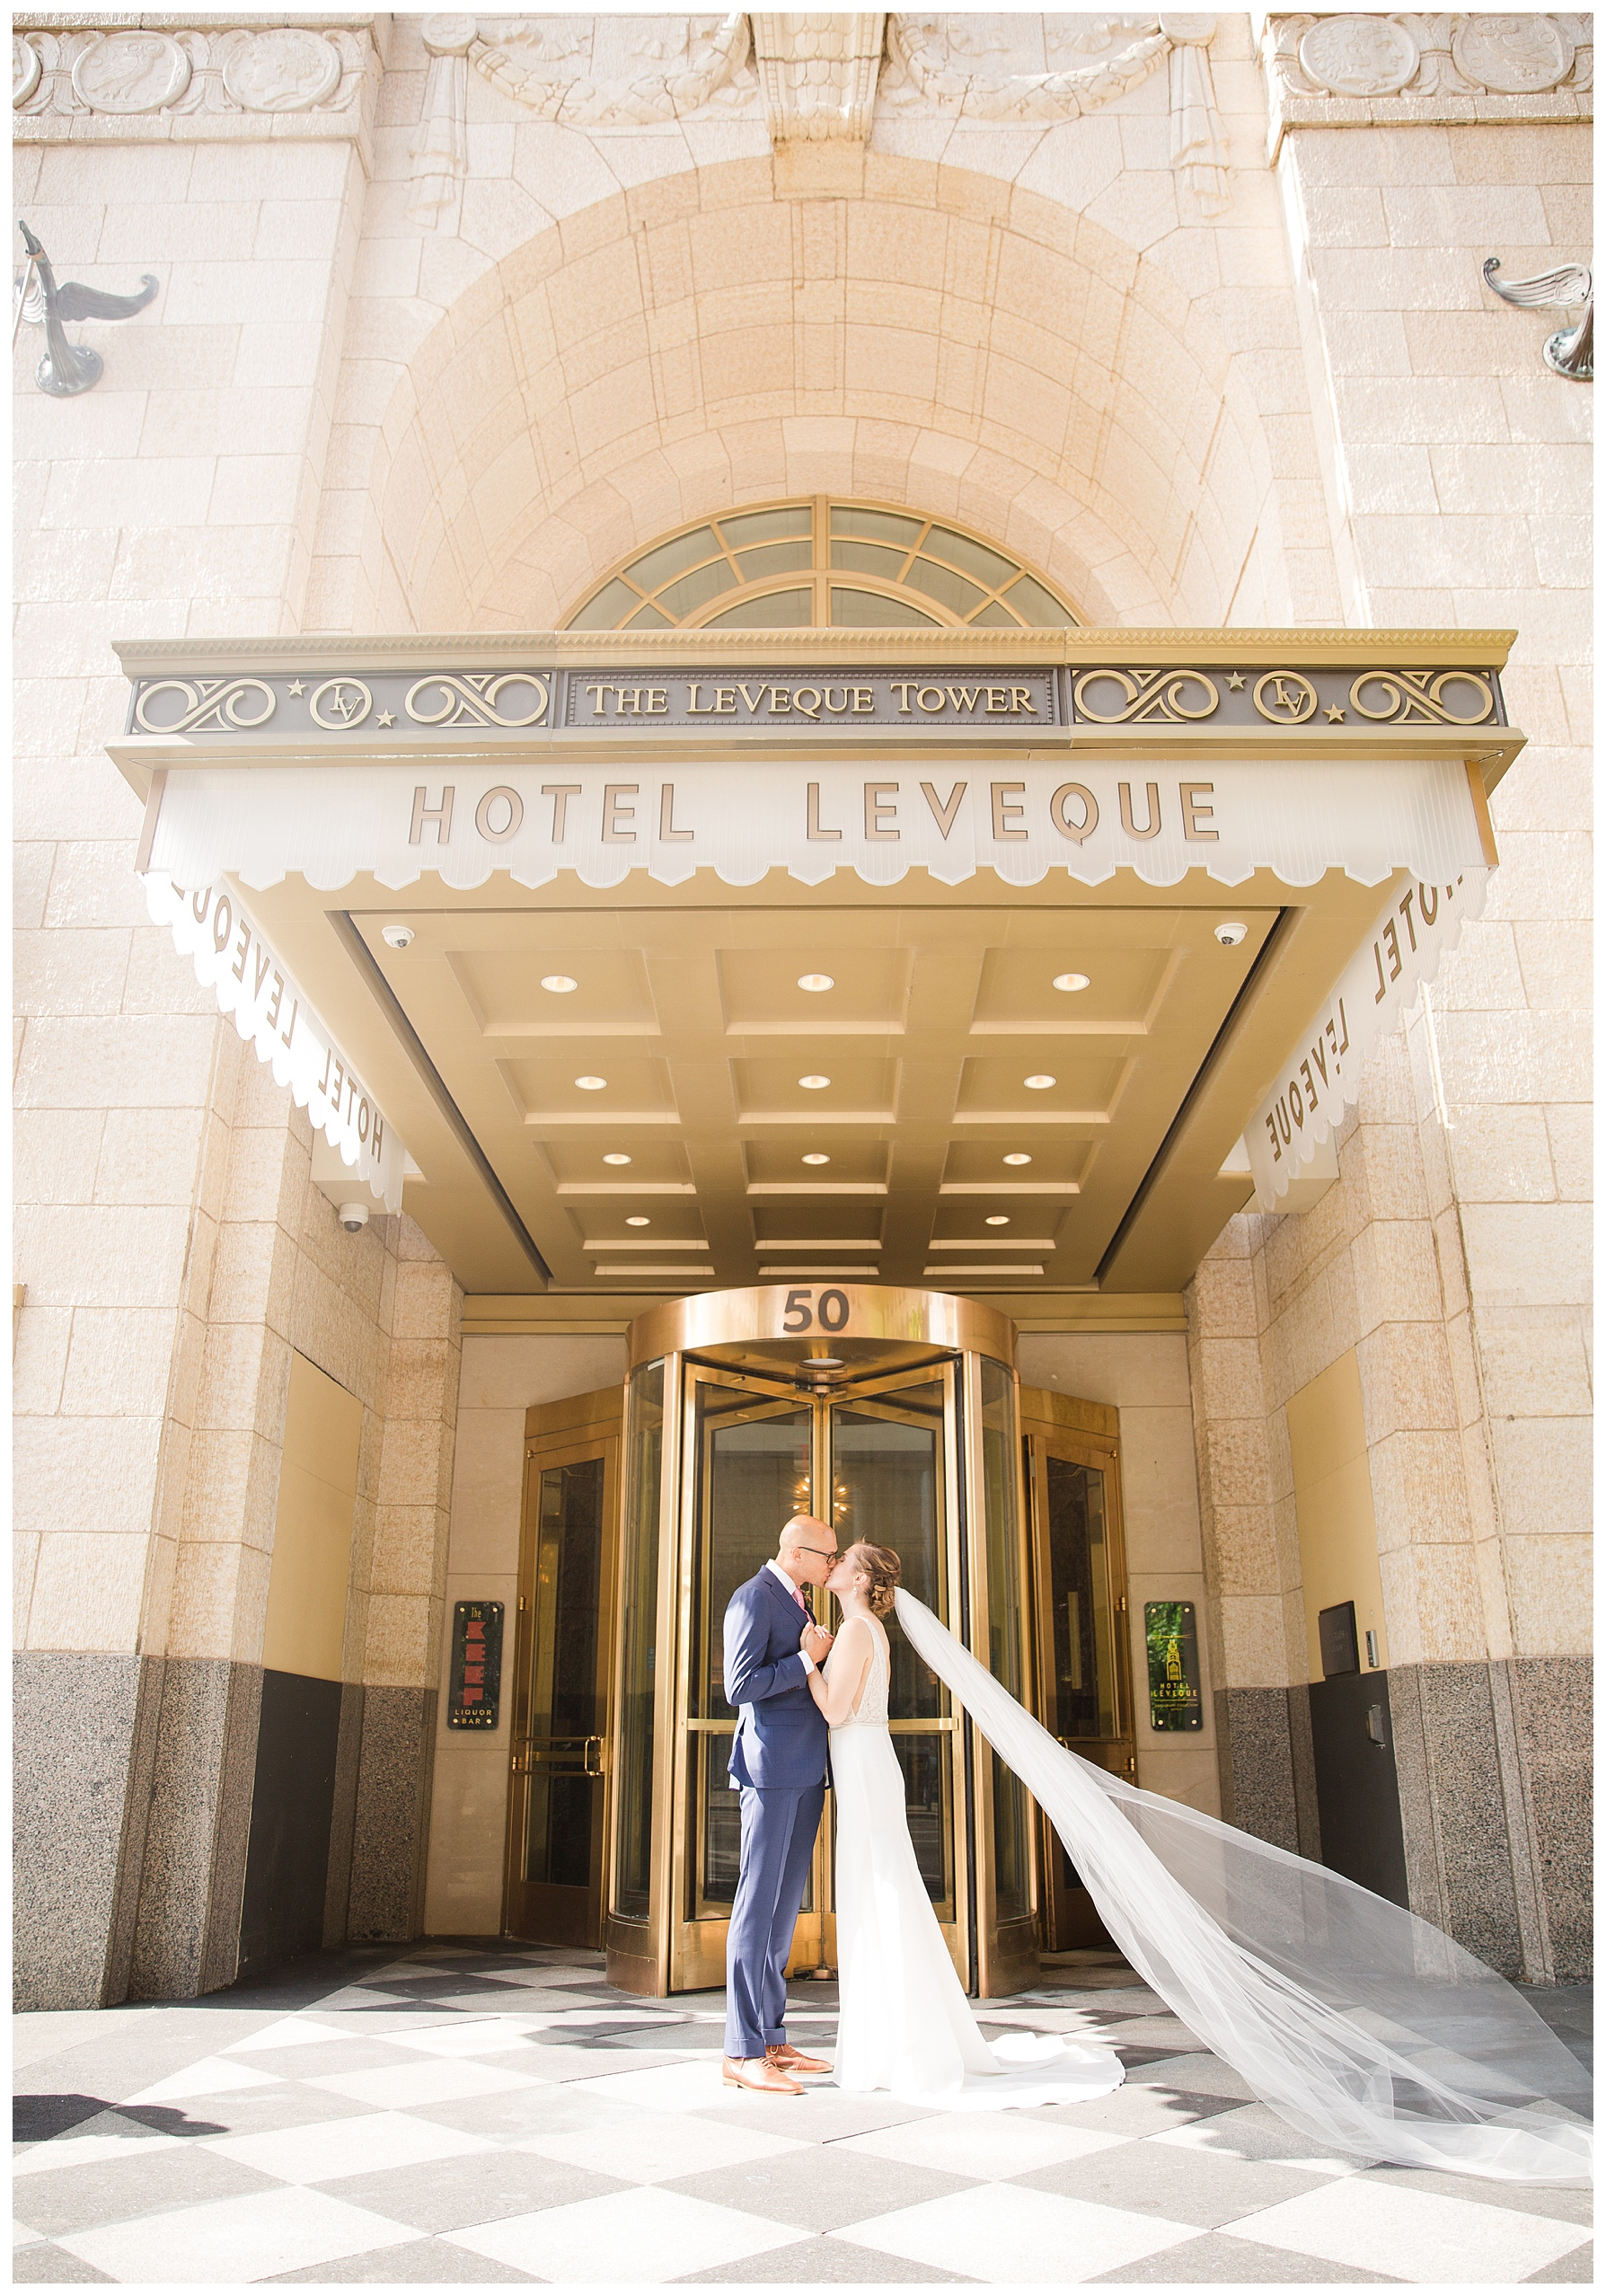 hotel-LeVeque-autograph-collection-columbus-wedding_0024.jpg